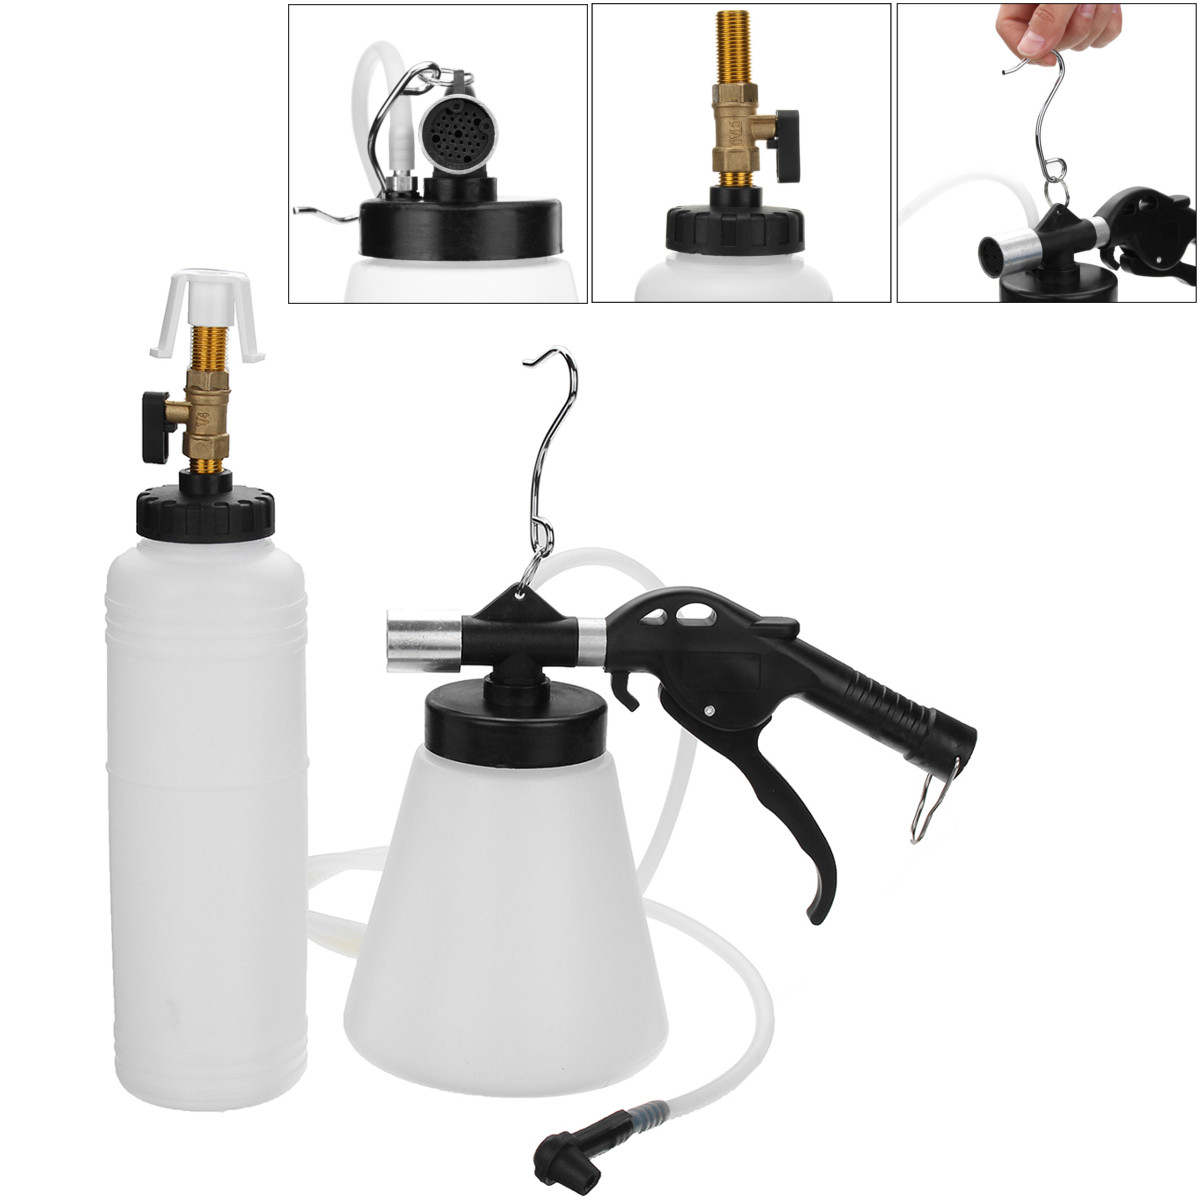 Pneumatic Brake Fluid Bleeder Kit Car Air Extractor Vacuum Clutch Oil Bottle